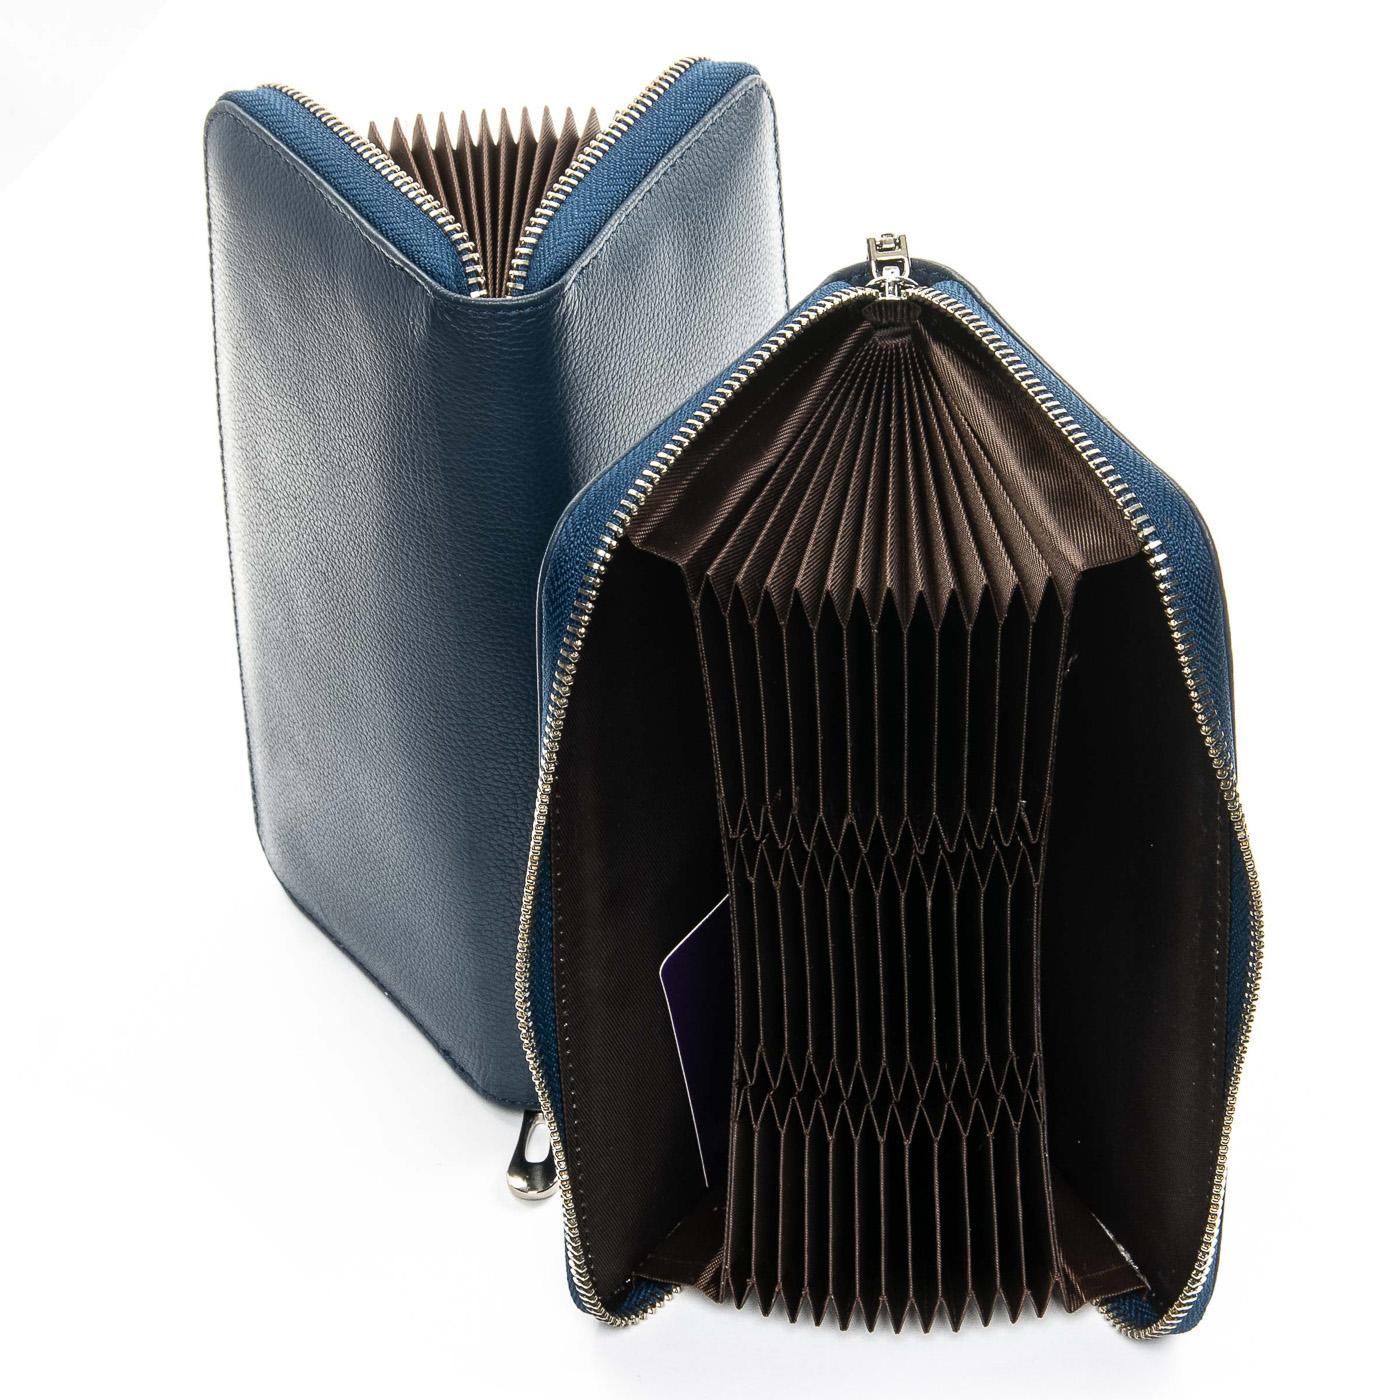 Кошелек Classic кожа DR. BOND WS-8 blue - фото 4